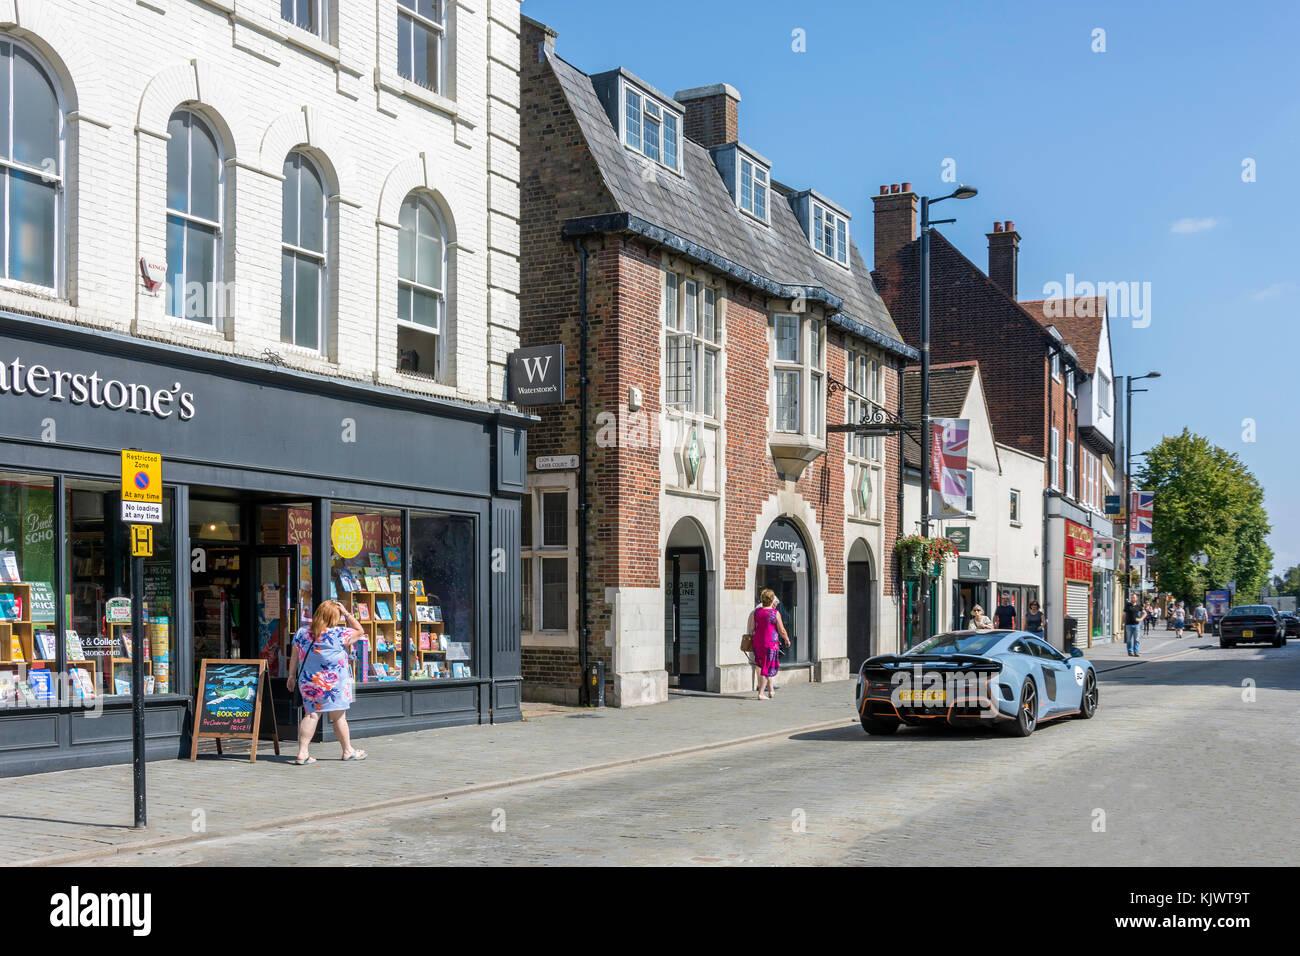 High Street, Brentwood, Essex, England, United Kingdom - Stock Image